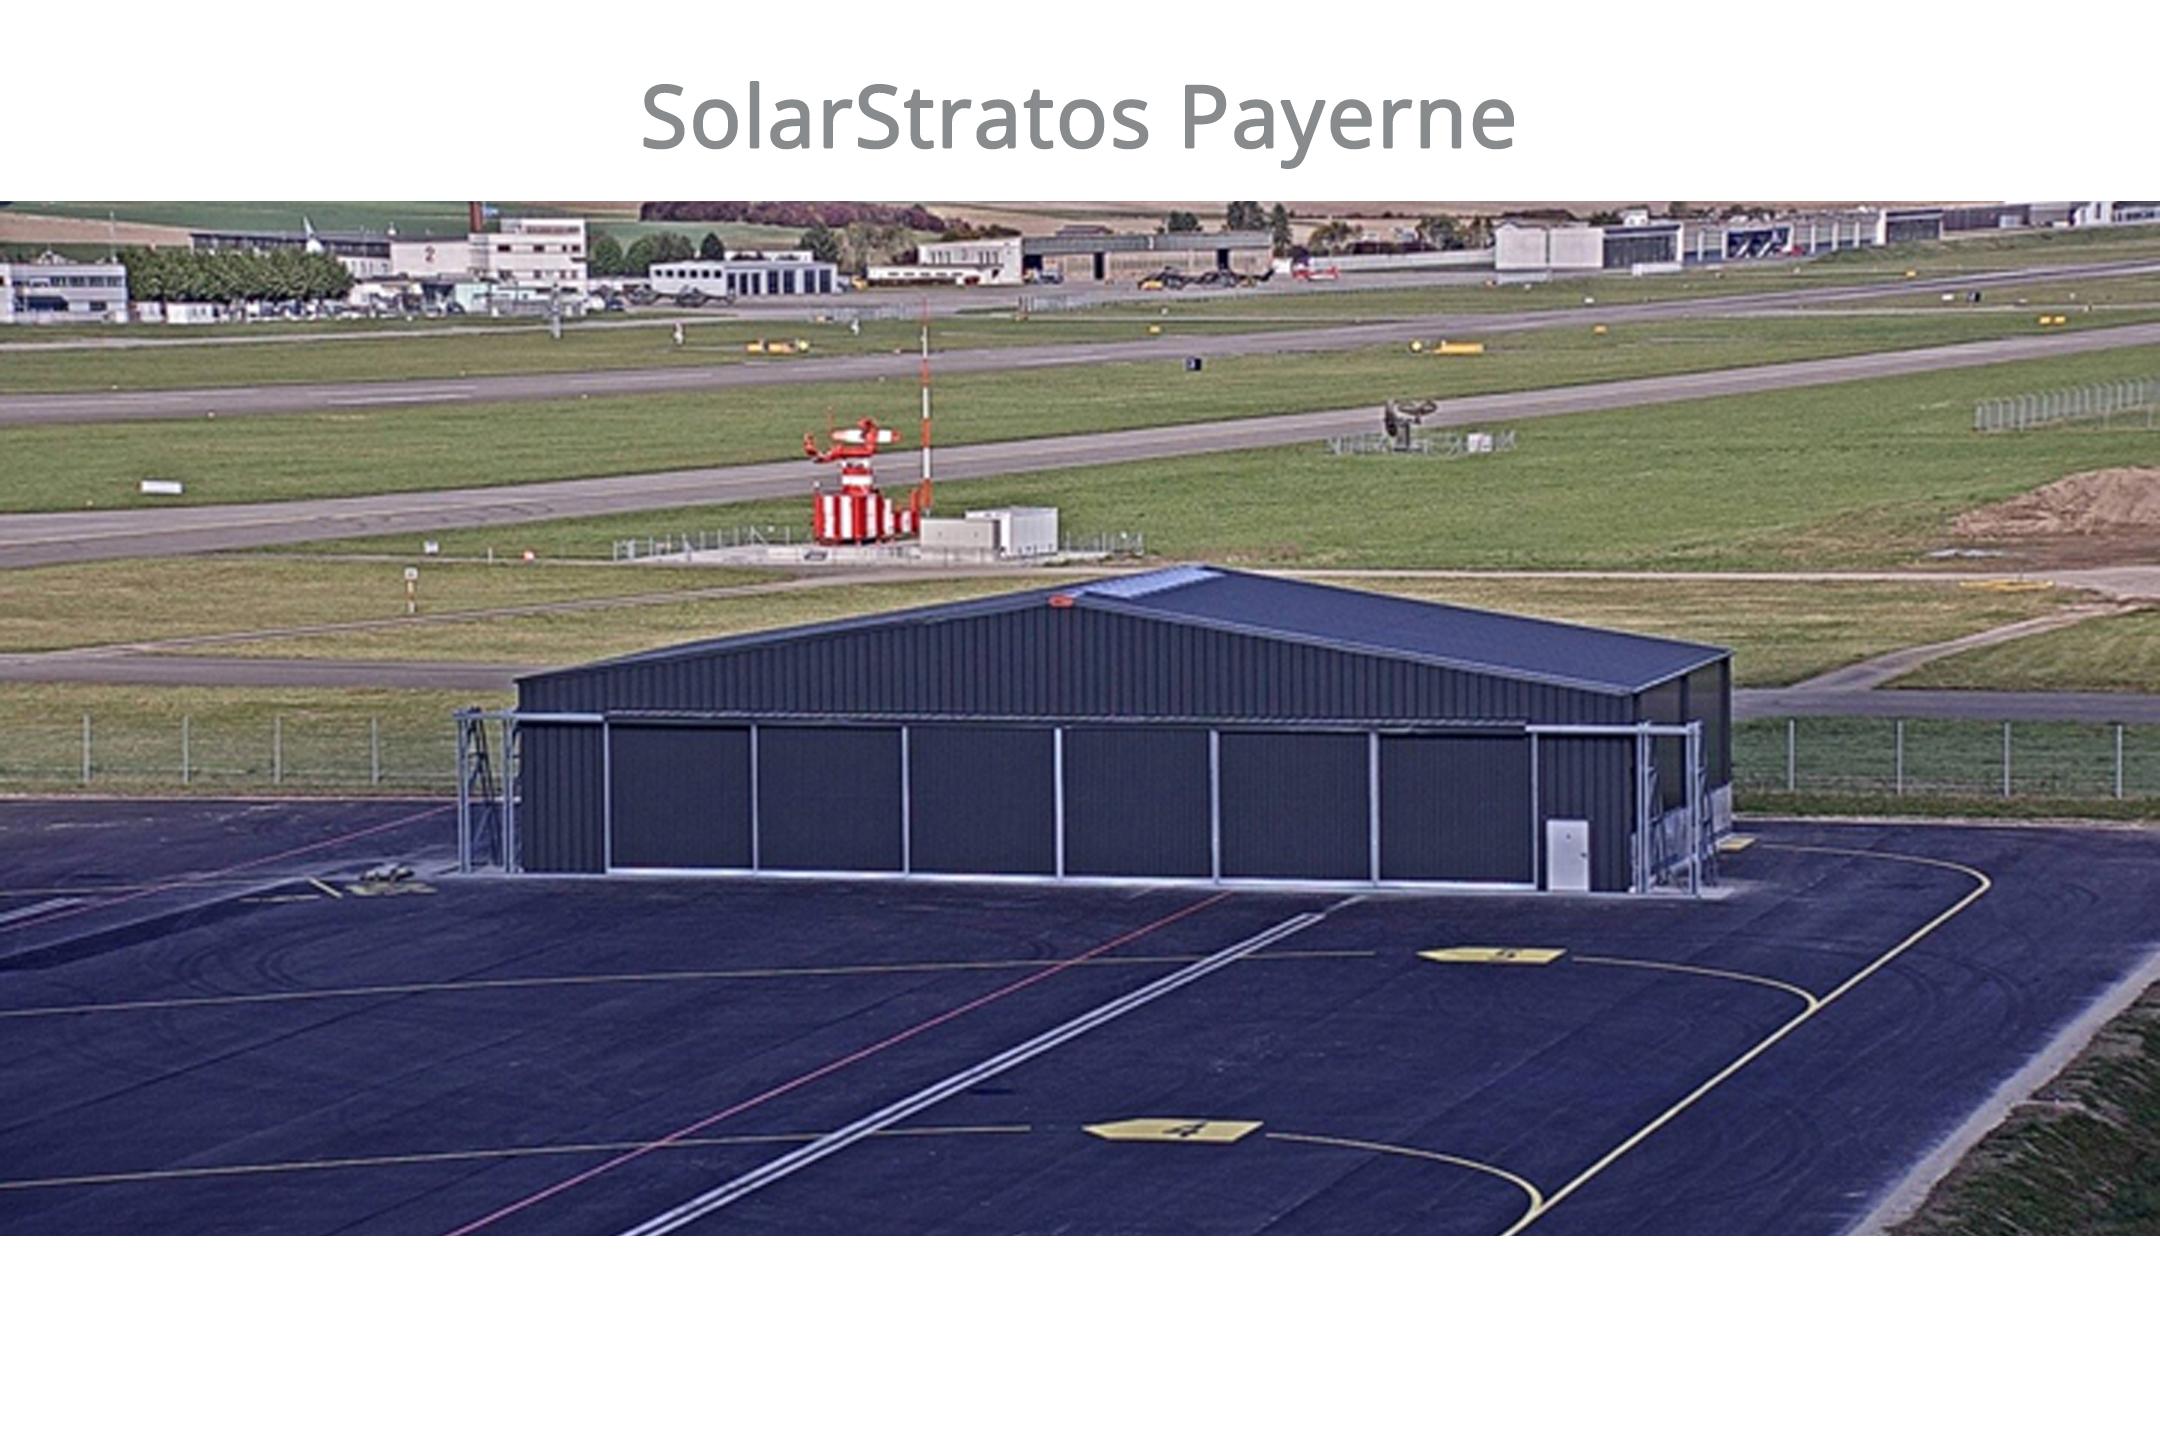 SolarStratos Payerne